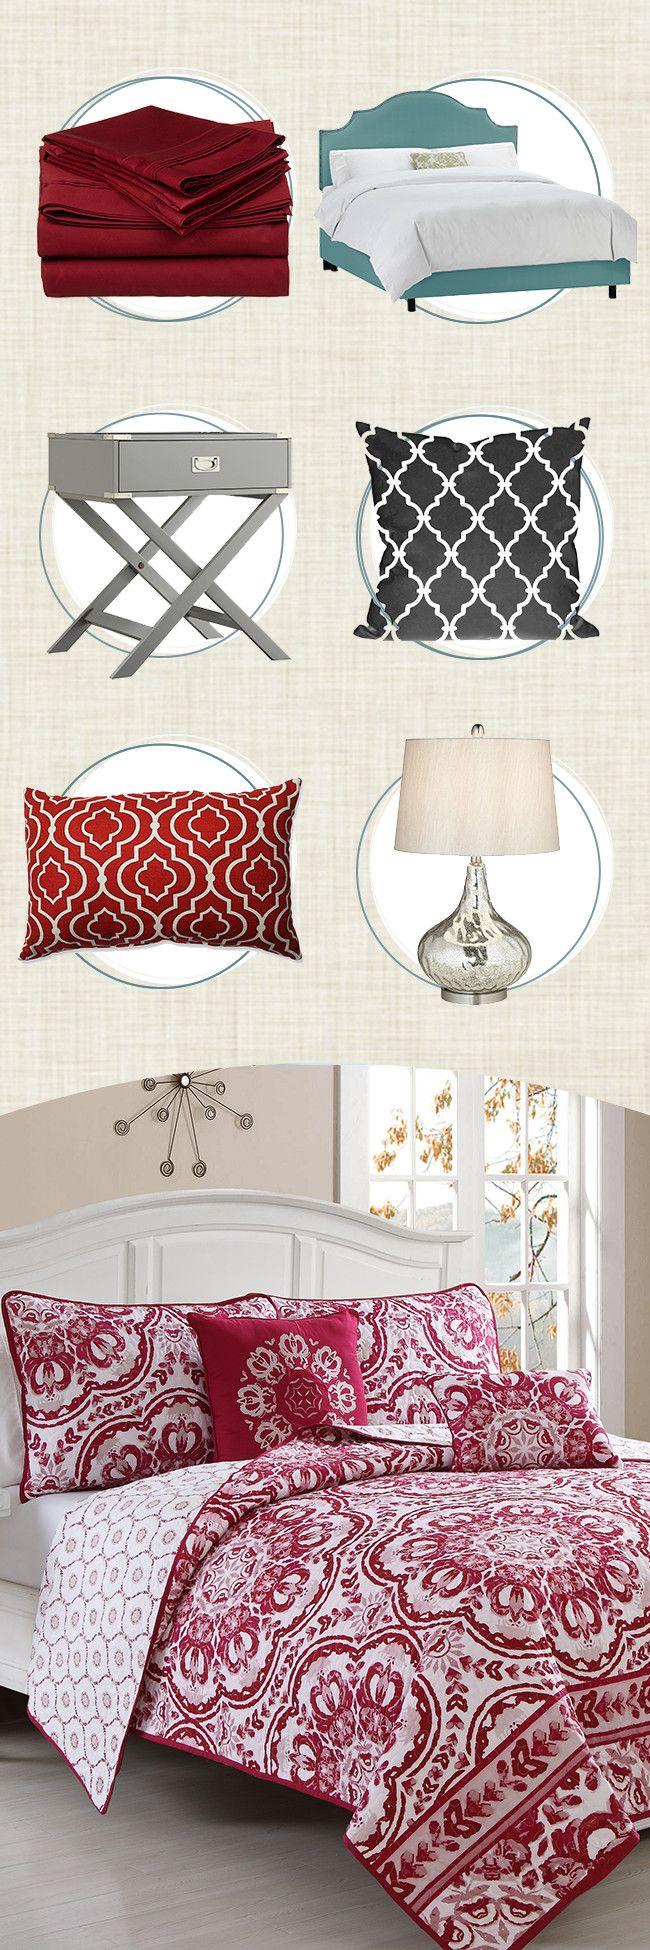 Design Your Own Bedroom Furniture Delectable Inspiration